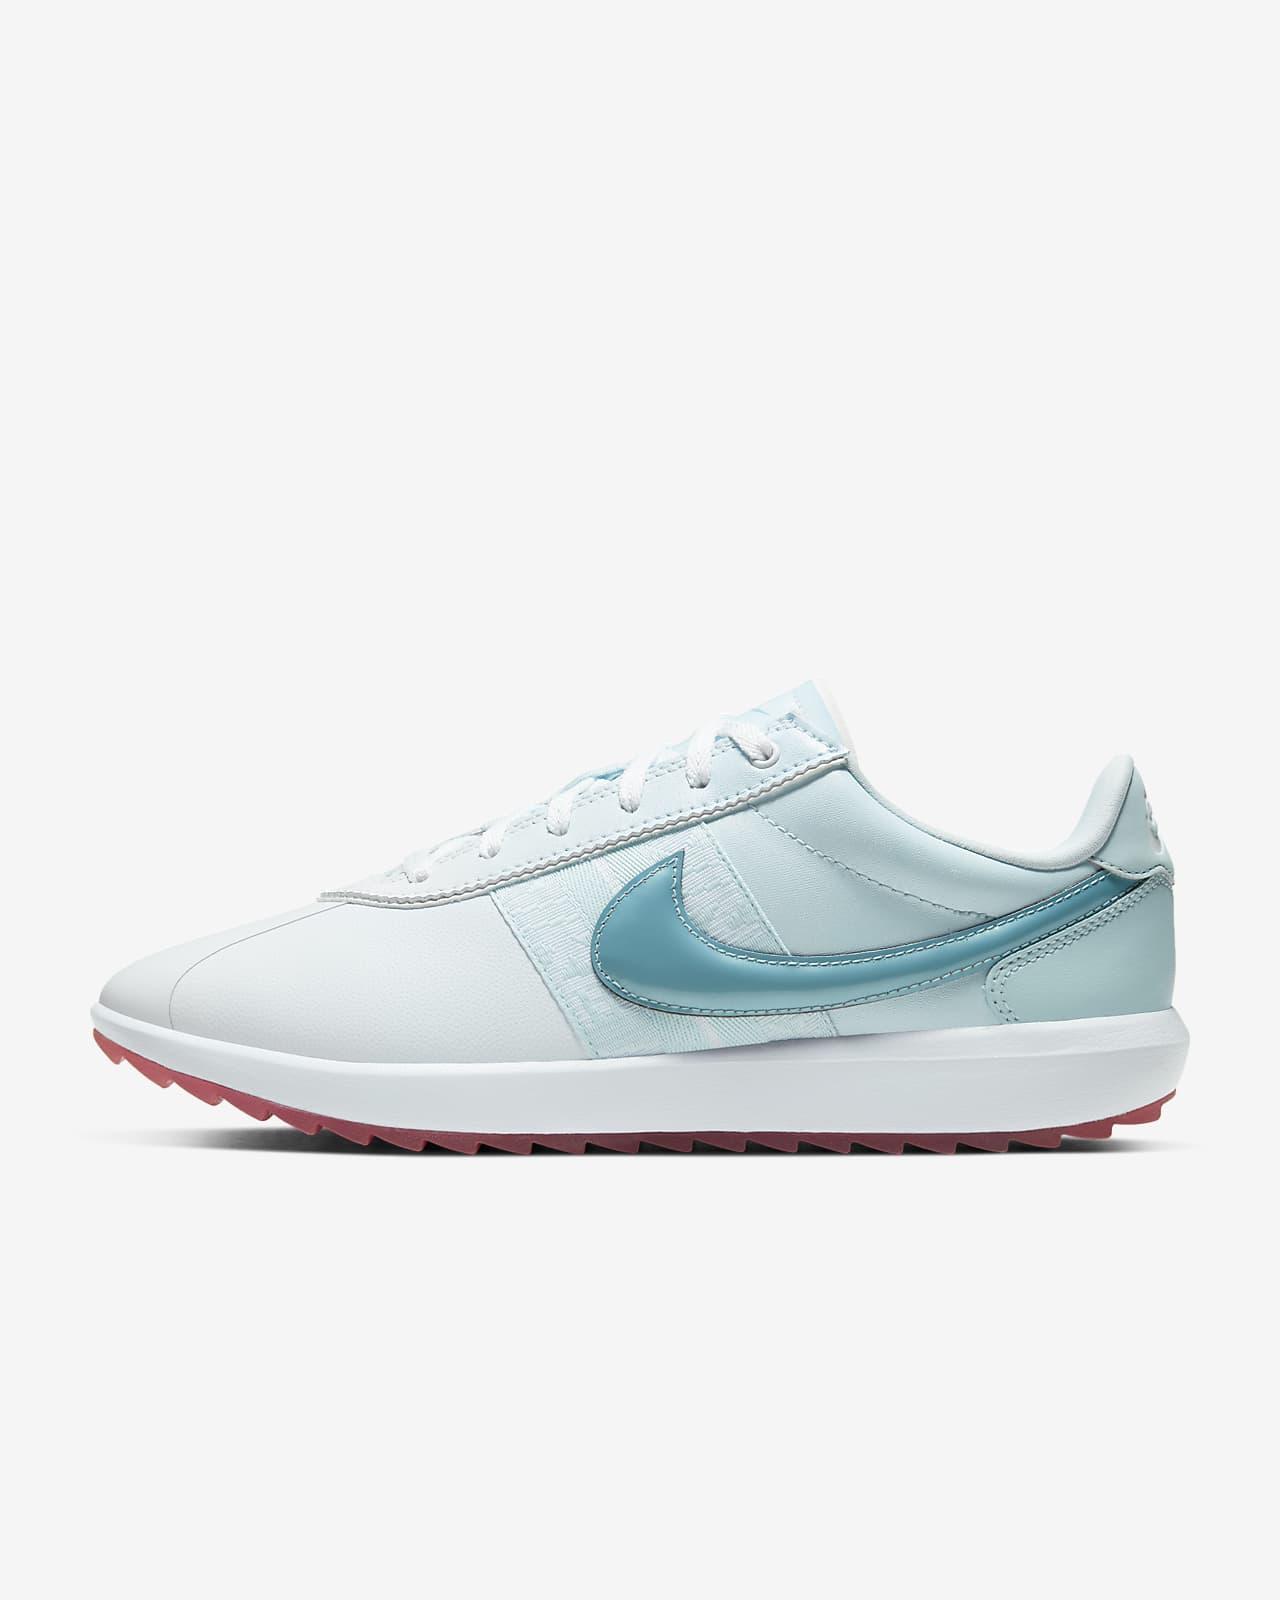 nike golf zapatos mujer